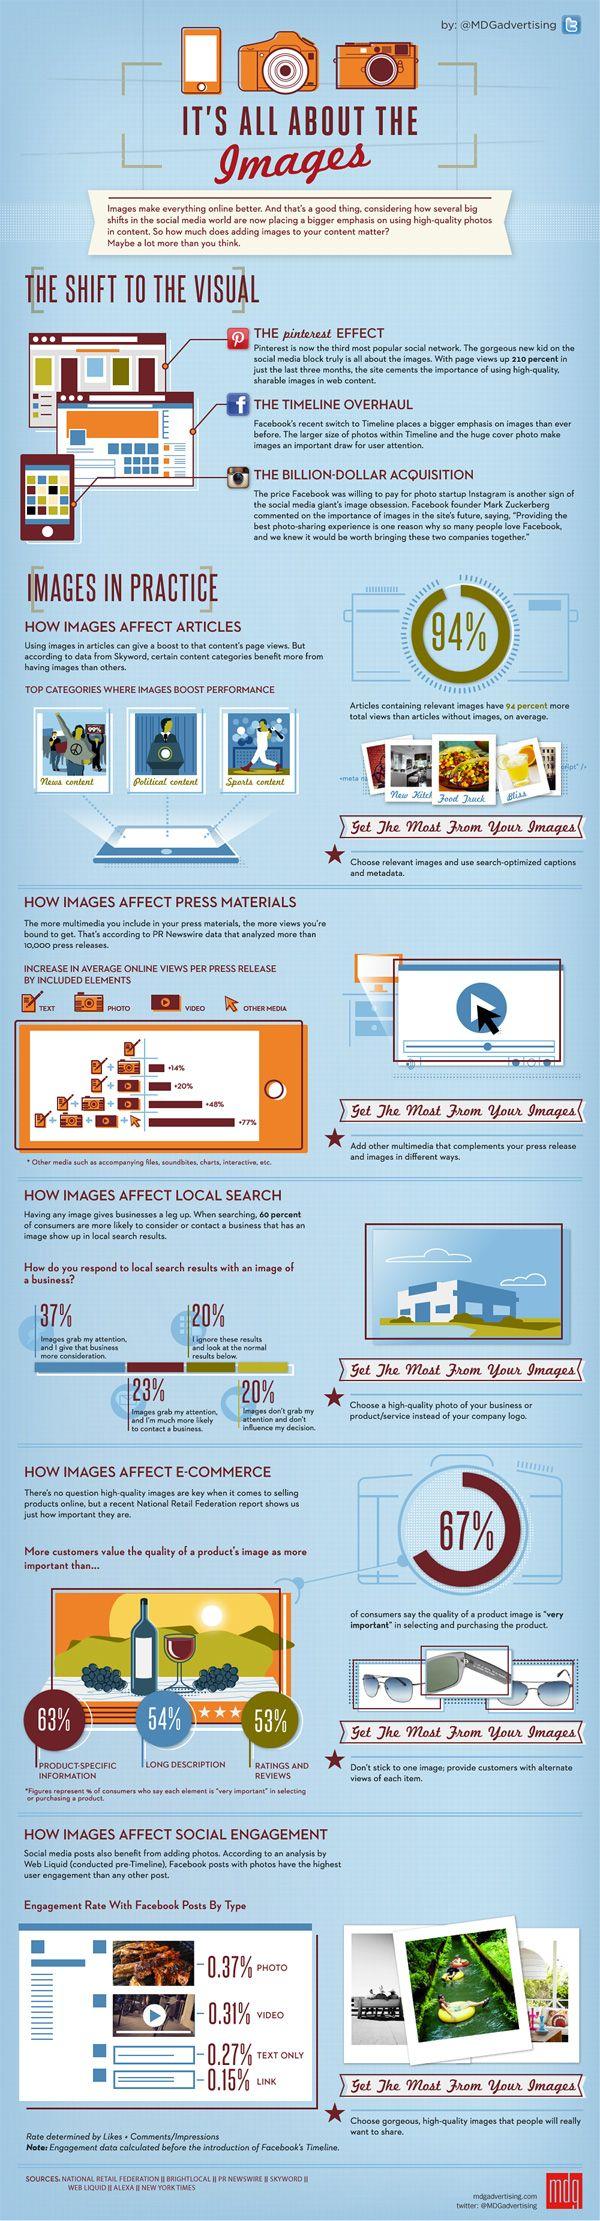 Infographic using photos